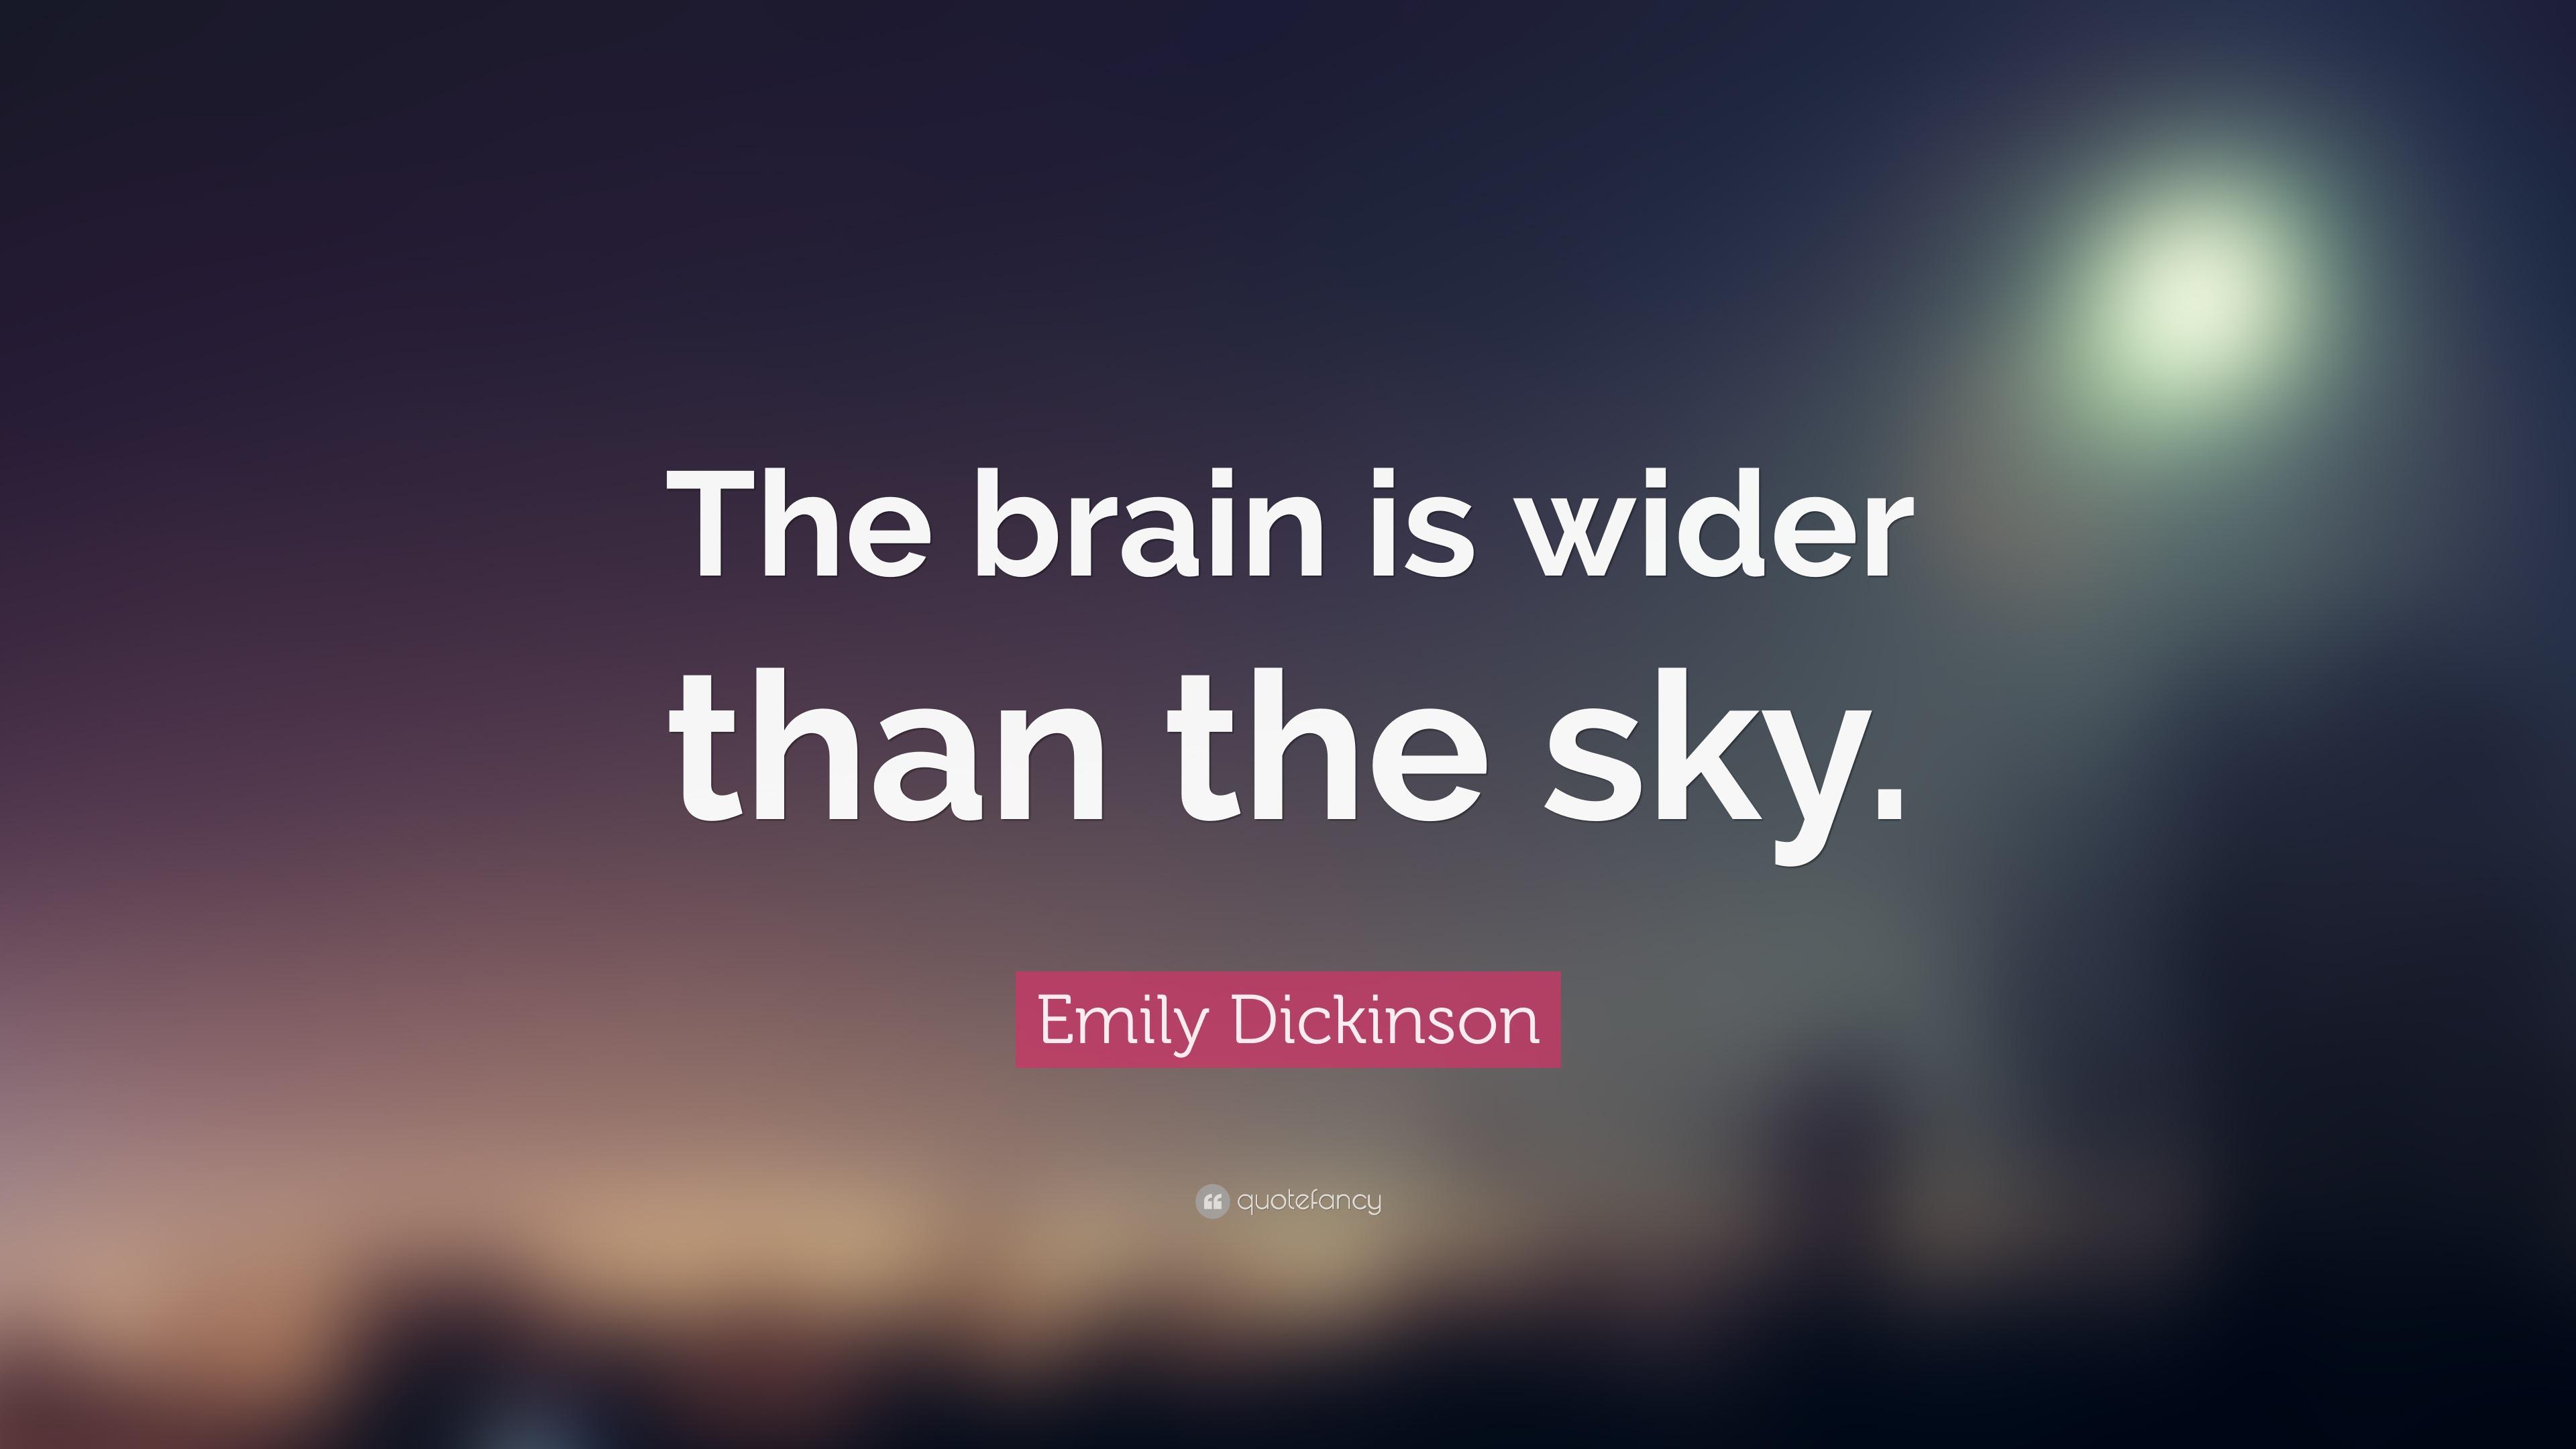 an analysis of emily dickinsons the brain is wider than the sky The brain&mdashis wider than the sky by emily dickinson 632 the brainmdashis wider than the skymdash formdashput them side by sidemdash the one the other will contain with easemdashand youmdashbesidemdash.